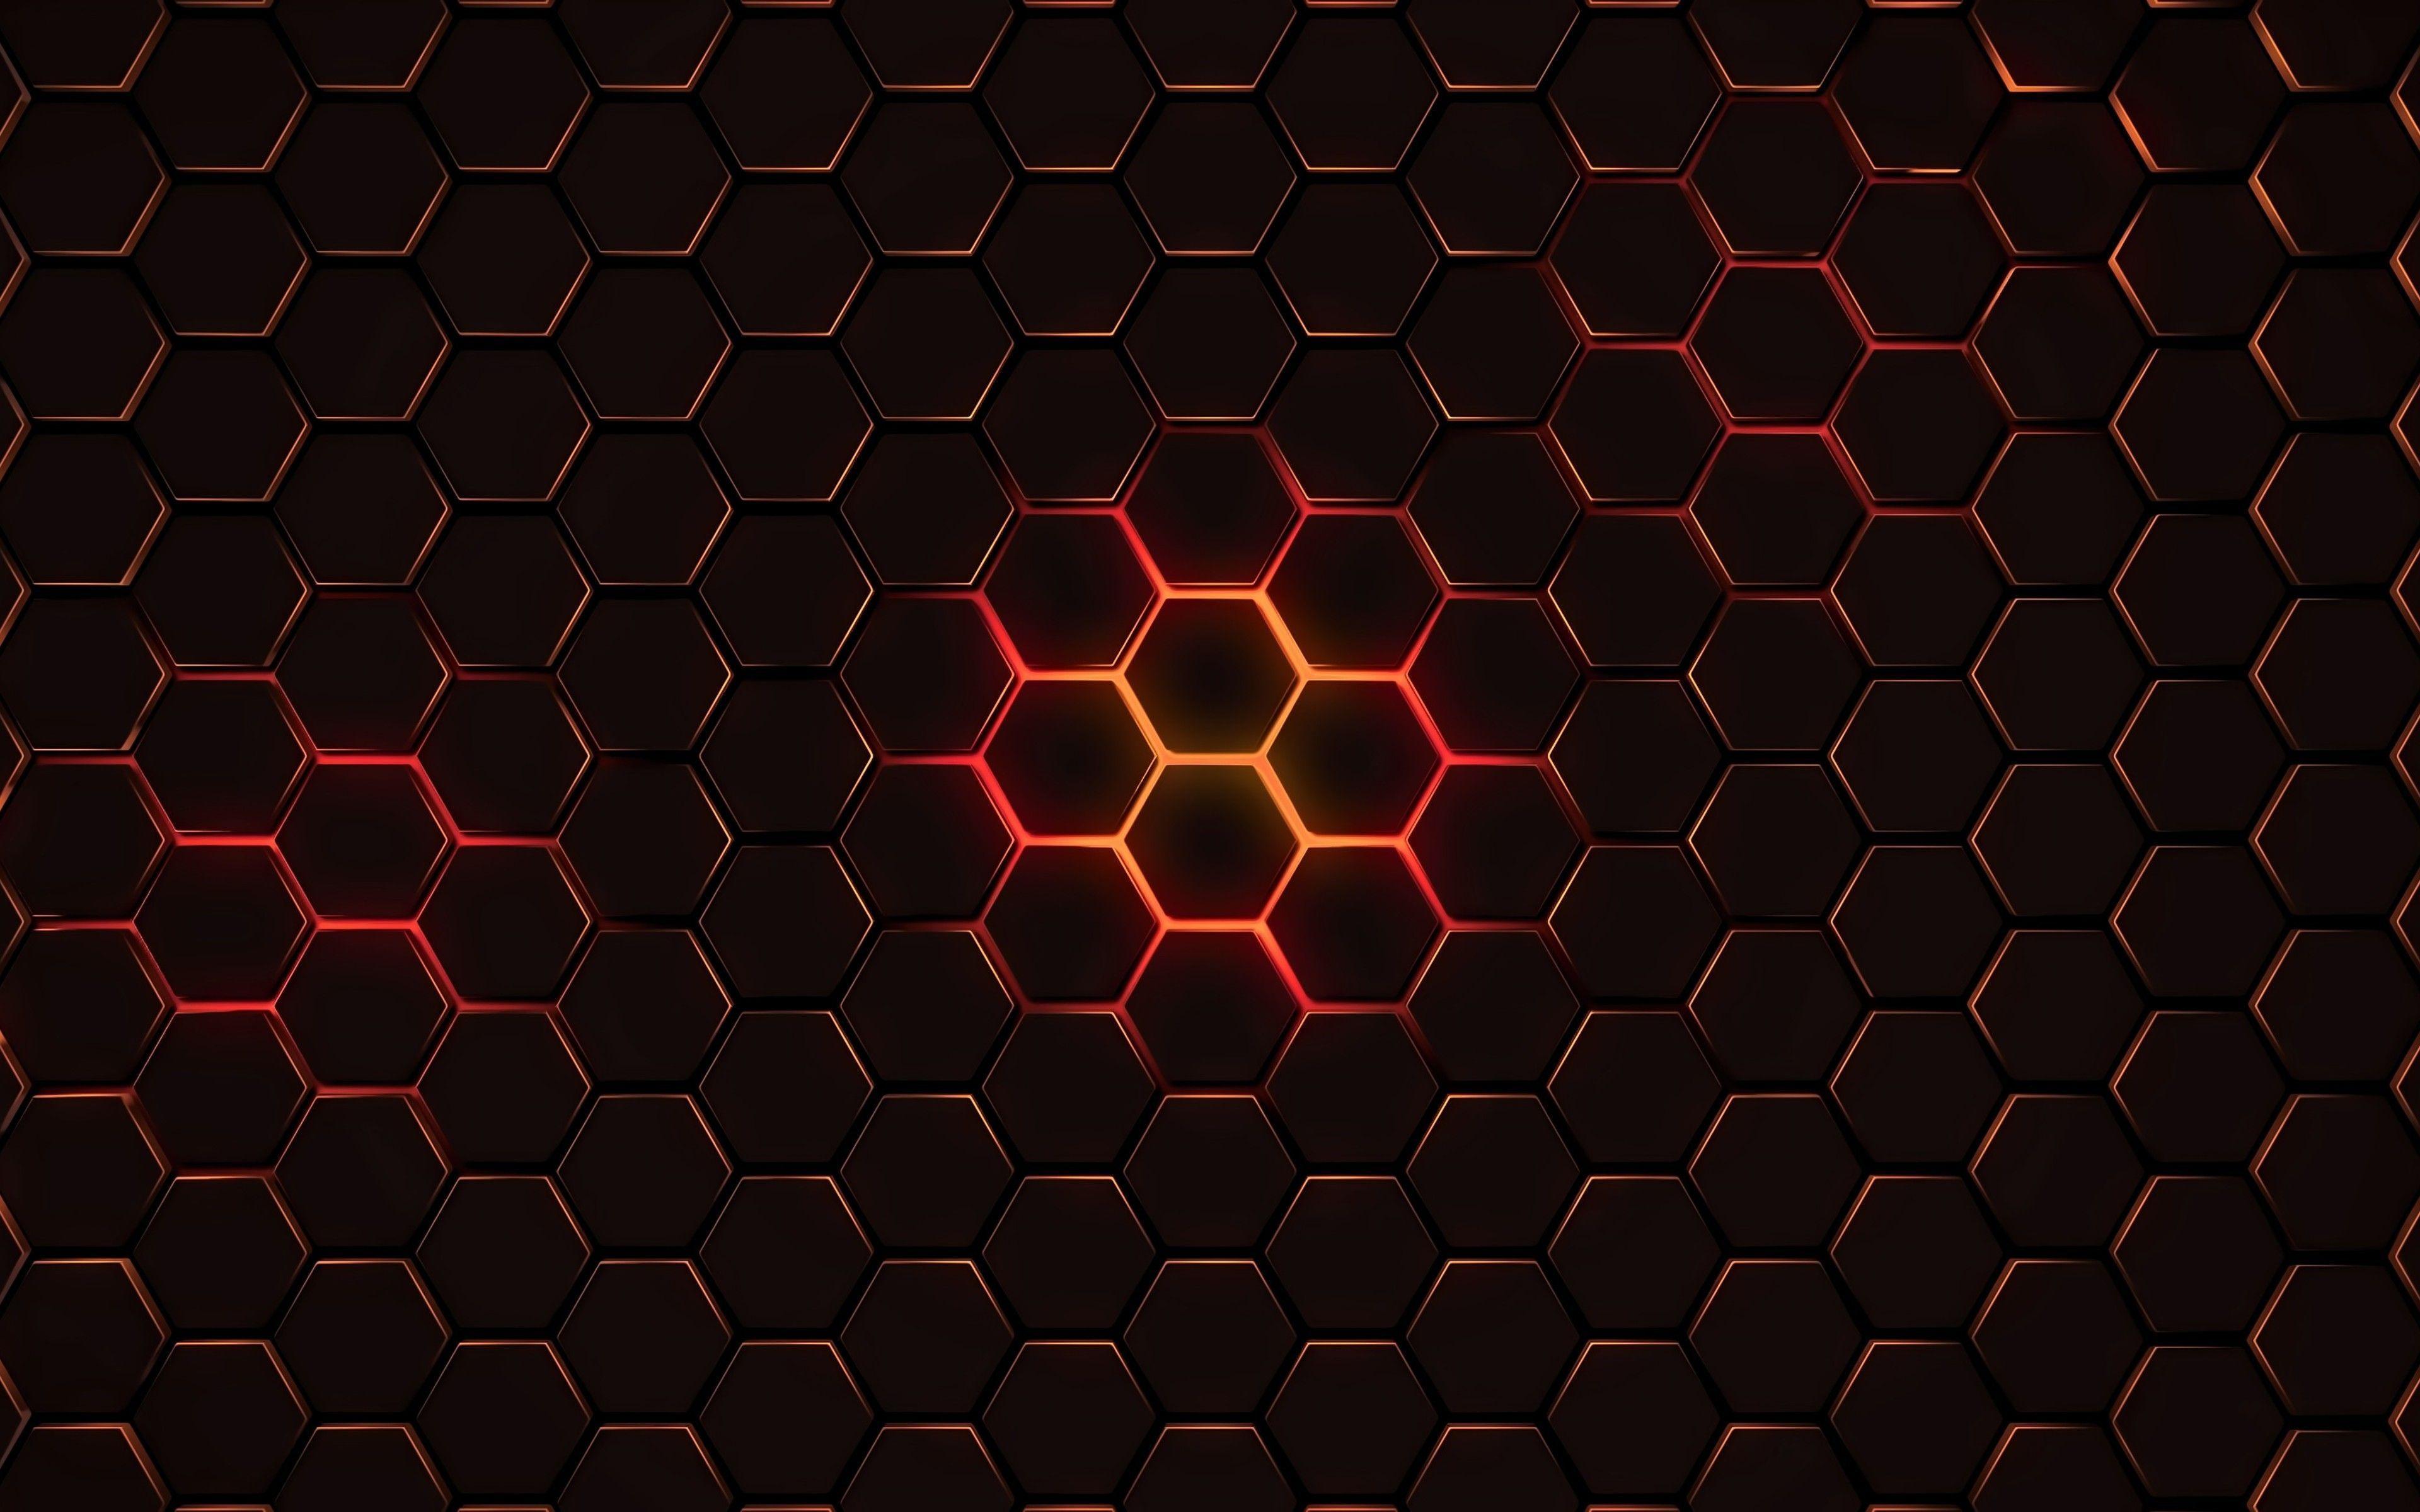 4K 3D Geometric Wallpapers - Top Free 4K 3D Geometric ...